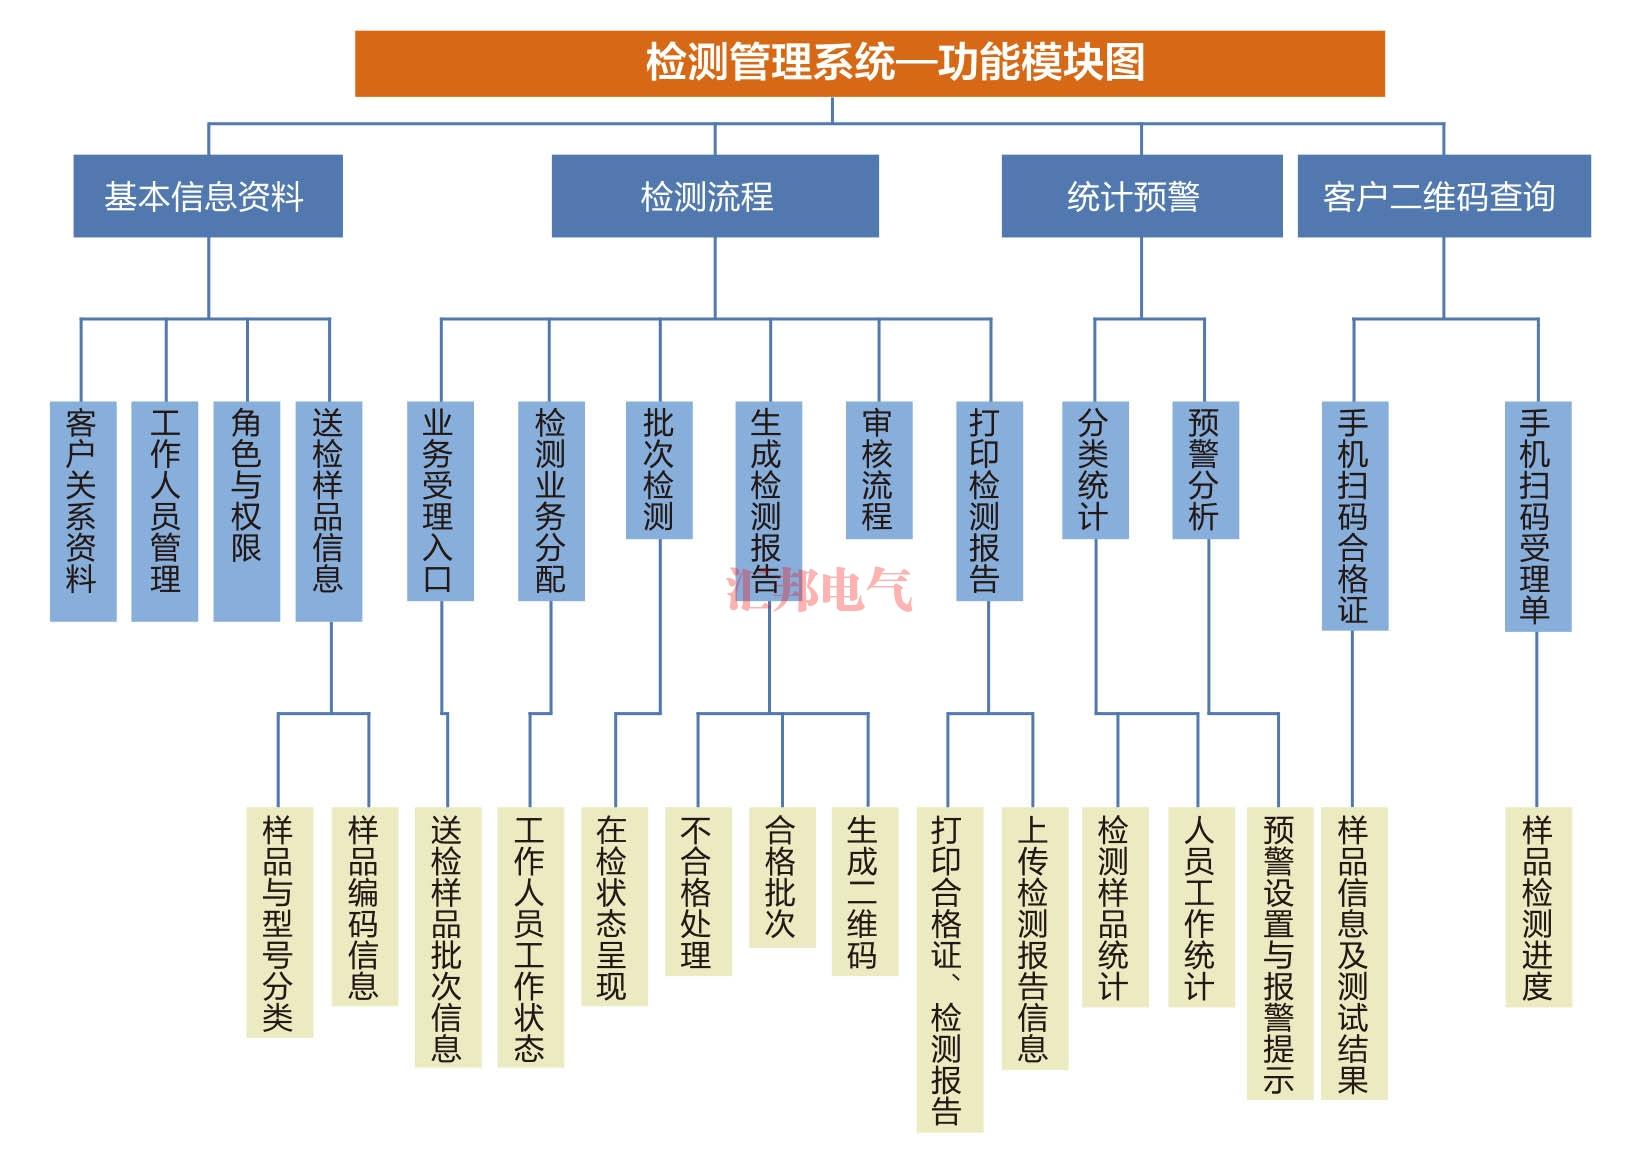 HBCTMS云平台试验管理系统